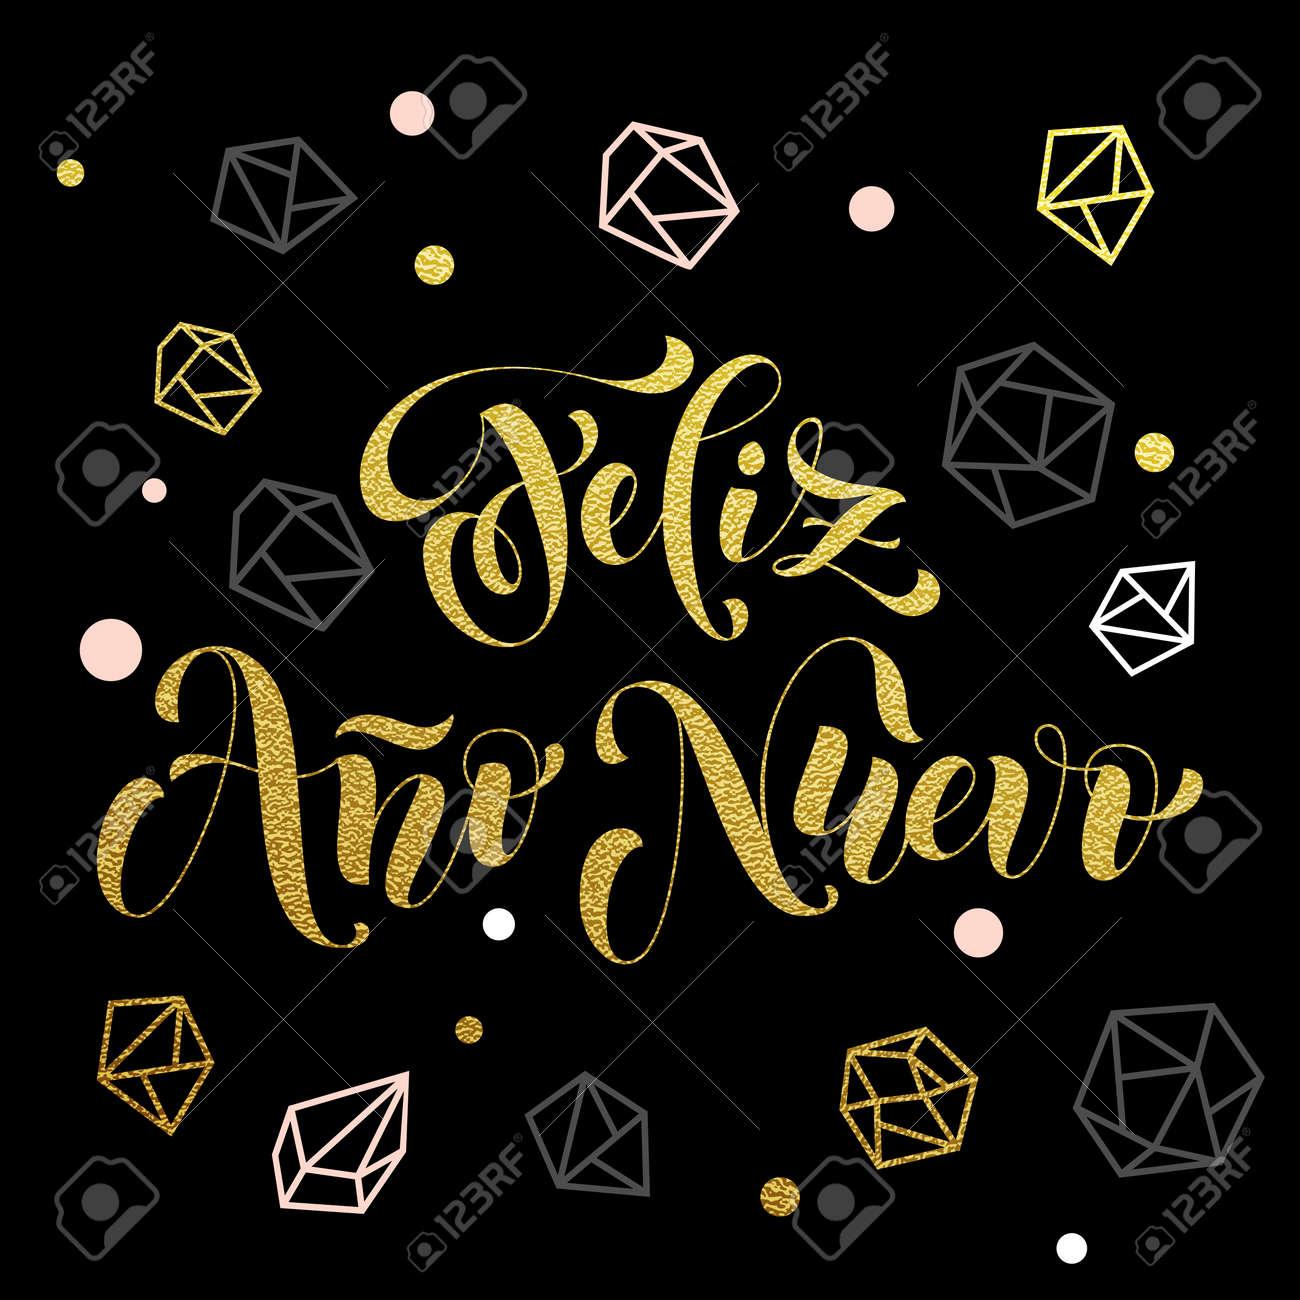 New Year In Spanish Golden Text Feliz Ano Nuevo Vector Greeting